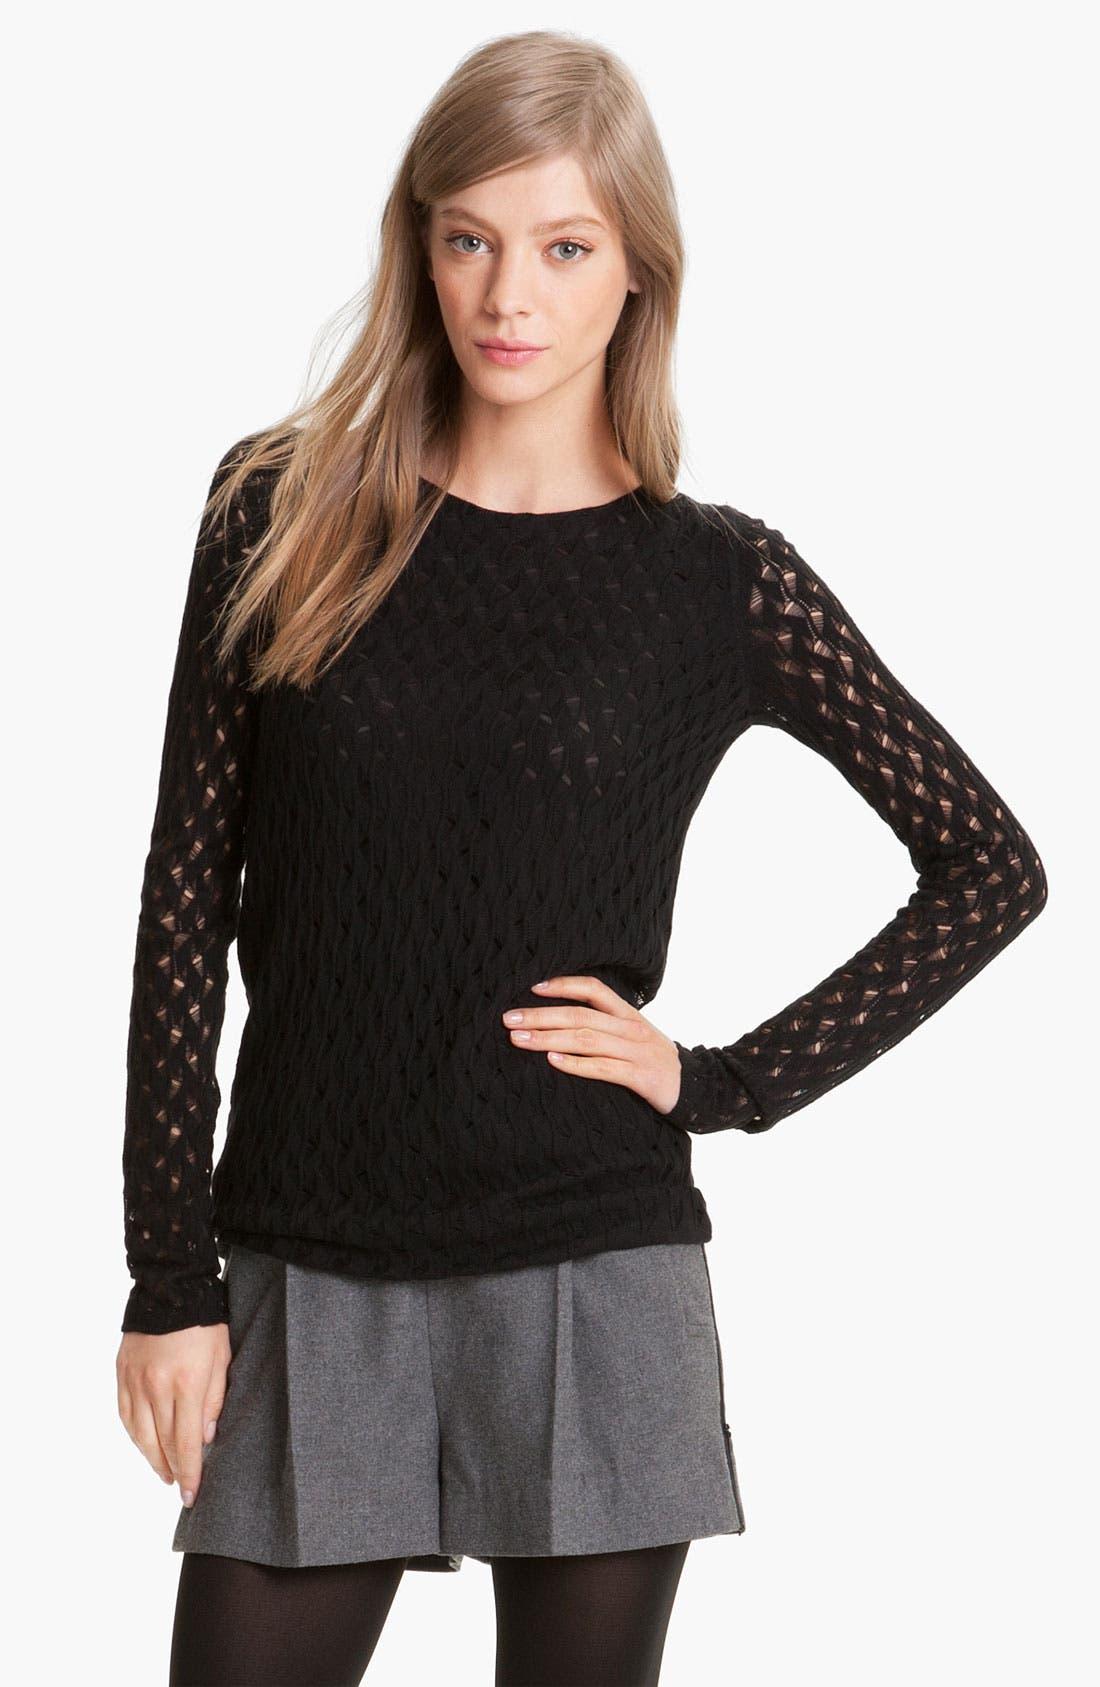 Alternate Image 1 Selected - Diane von Furstenberg 'Mendi Bis' Sweater